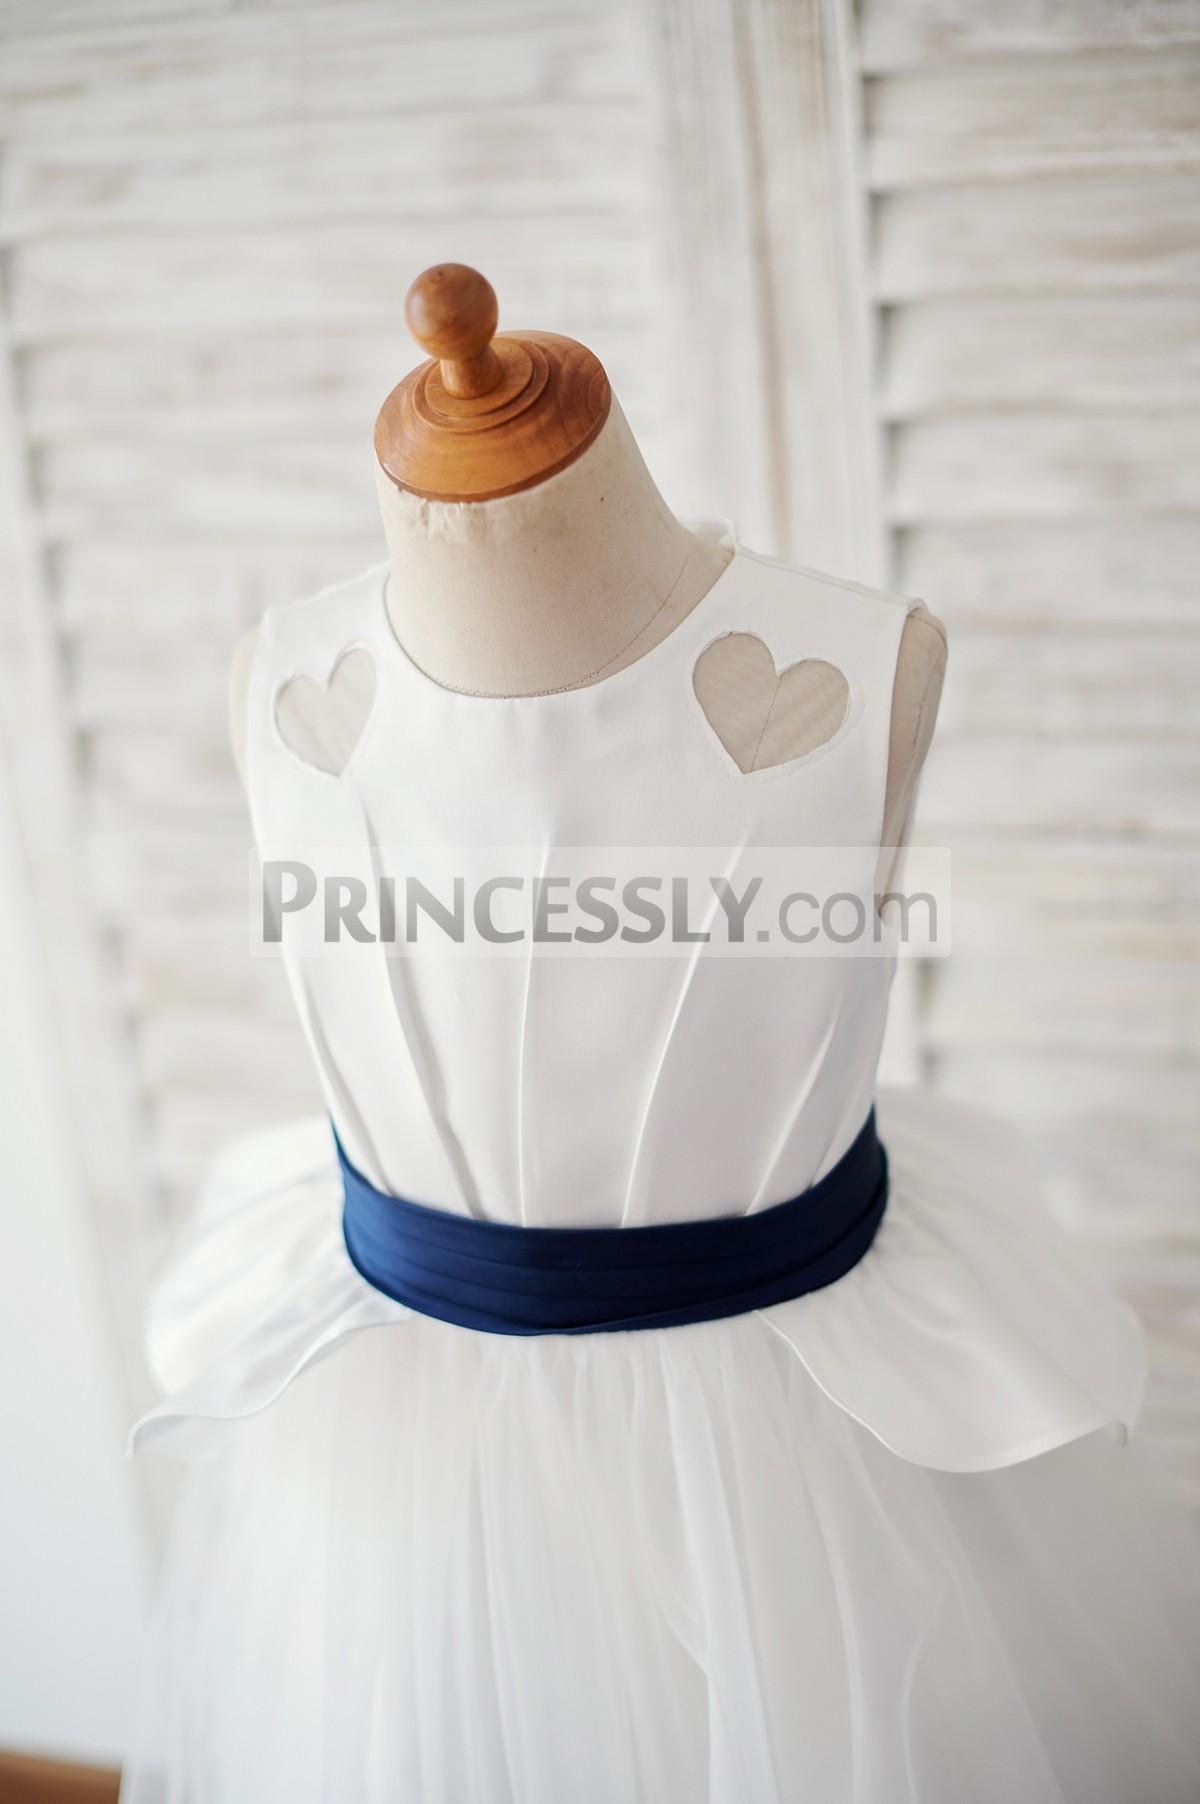 Heart shape cutout ivory satin bodice with navy blue belt